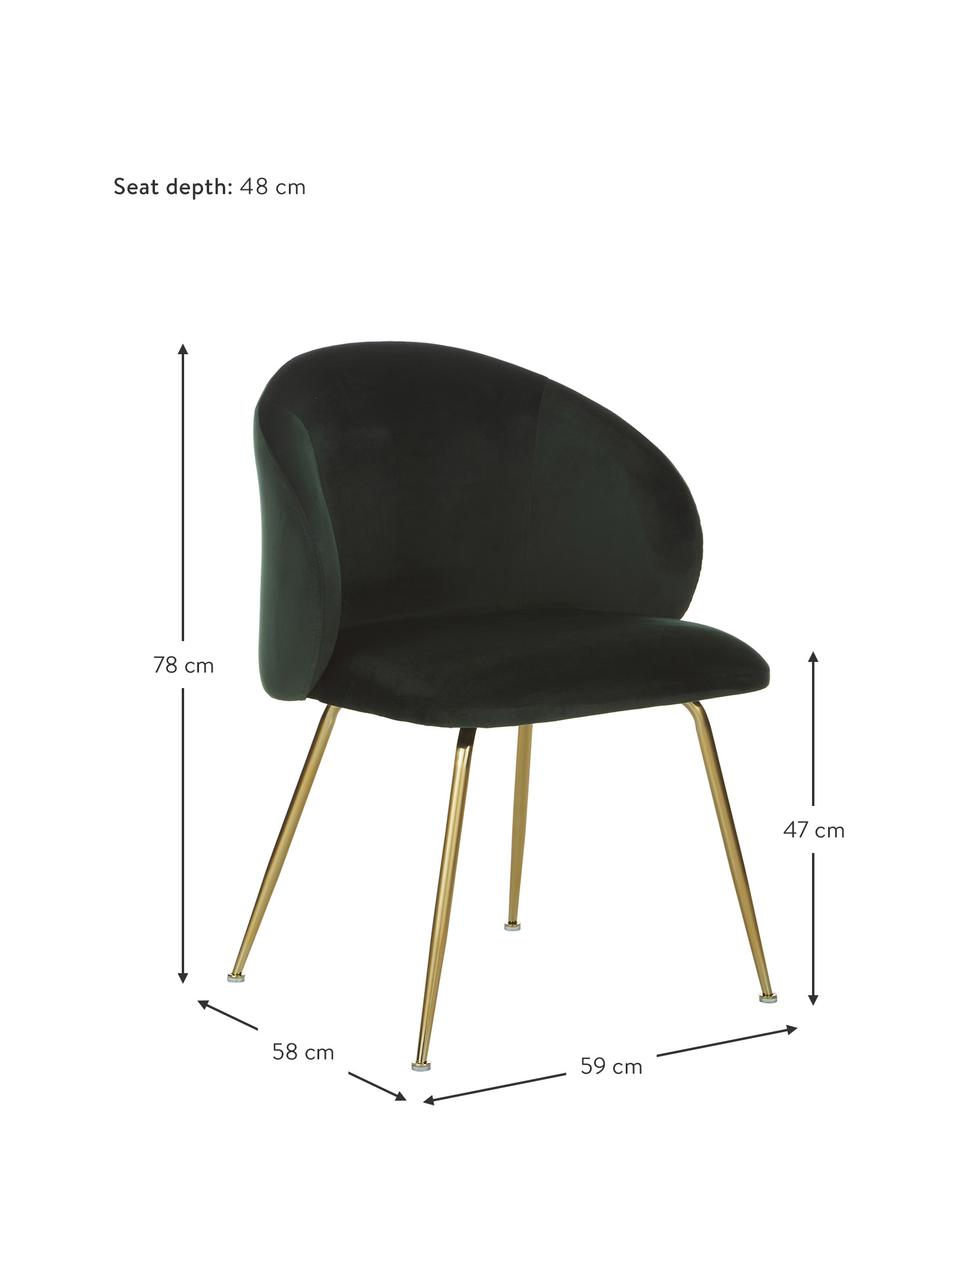 Sedia imbottita in velluto Luisa 2 pz, Rivestimento: velluto (100% poliestere), Gambe: metallo verniciato, Velluto verde scuro, oro, Larg. 59 x Prof. 58 cm